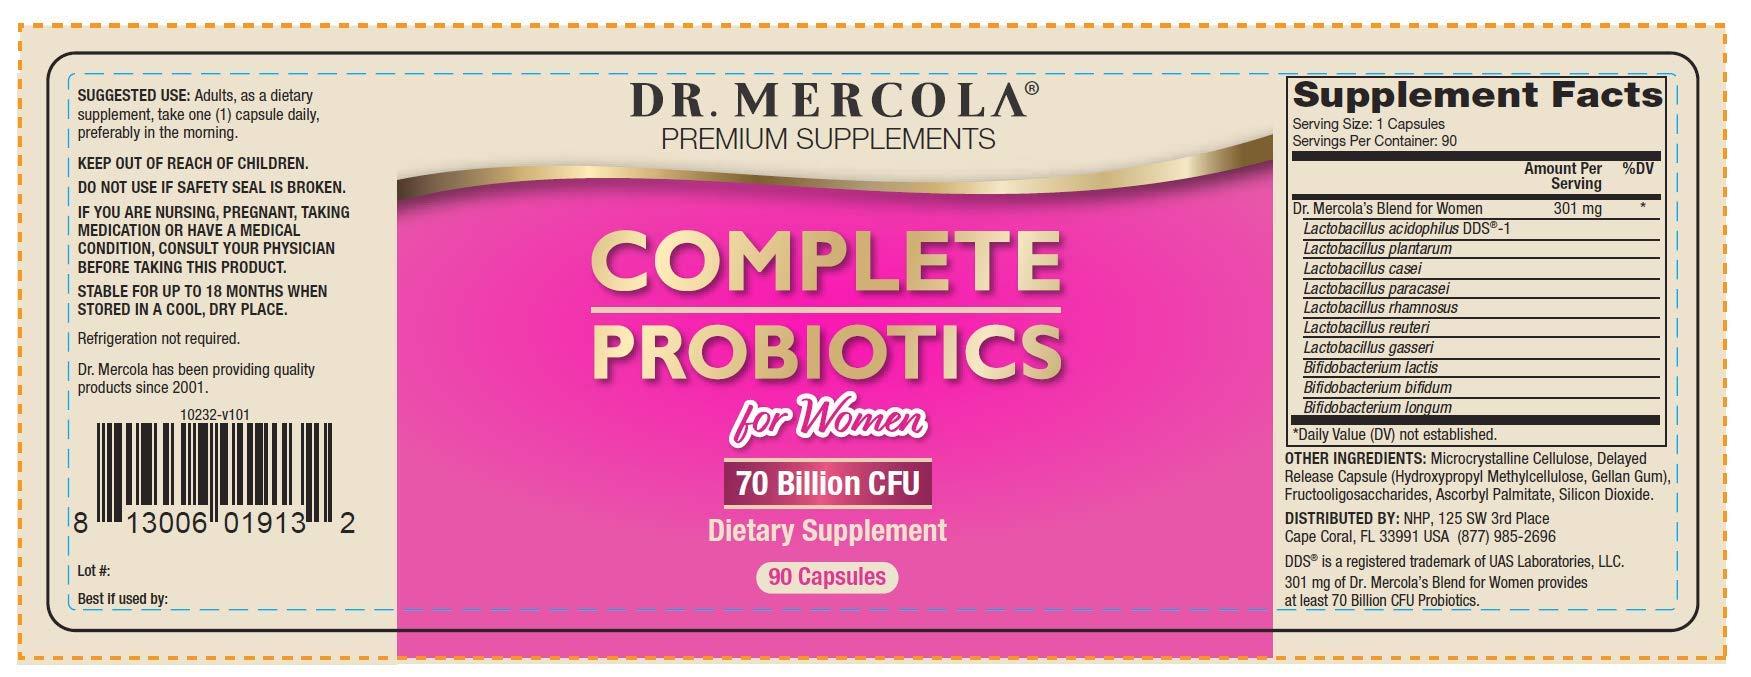 Dr. Mercola Complete Probiotics for Women - 180 caps - Customized Probiotic Blend for Women's Health Needs - Lactobacillus Rhamnosus, Acidophilus, Bifidobacterium - Support Healthy Female Microbiomes